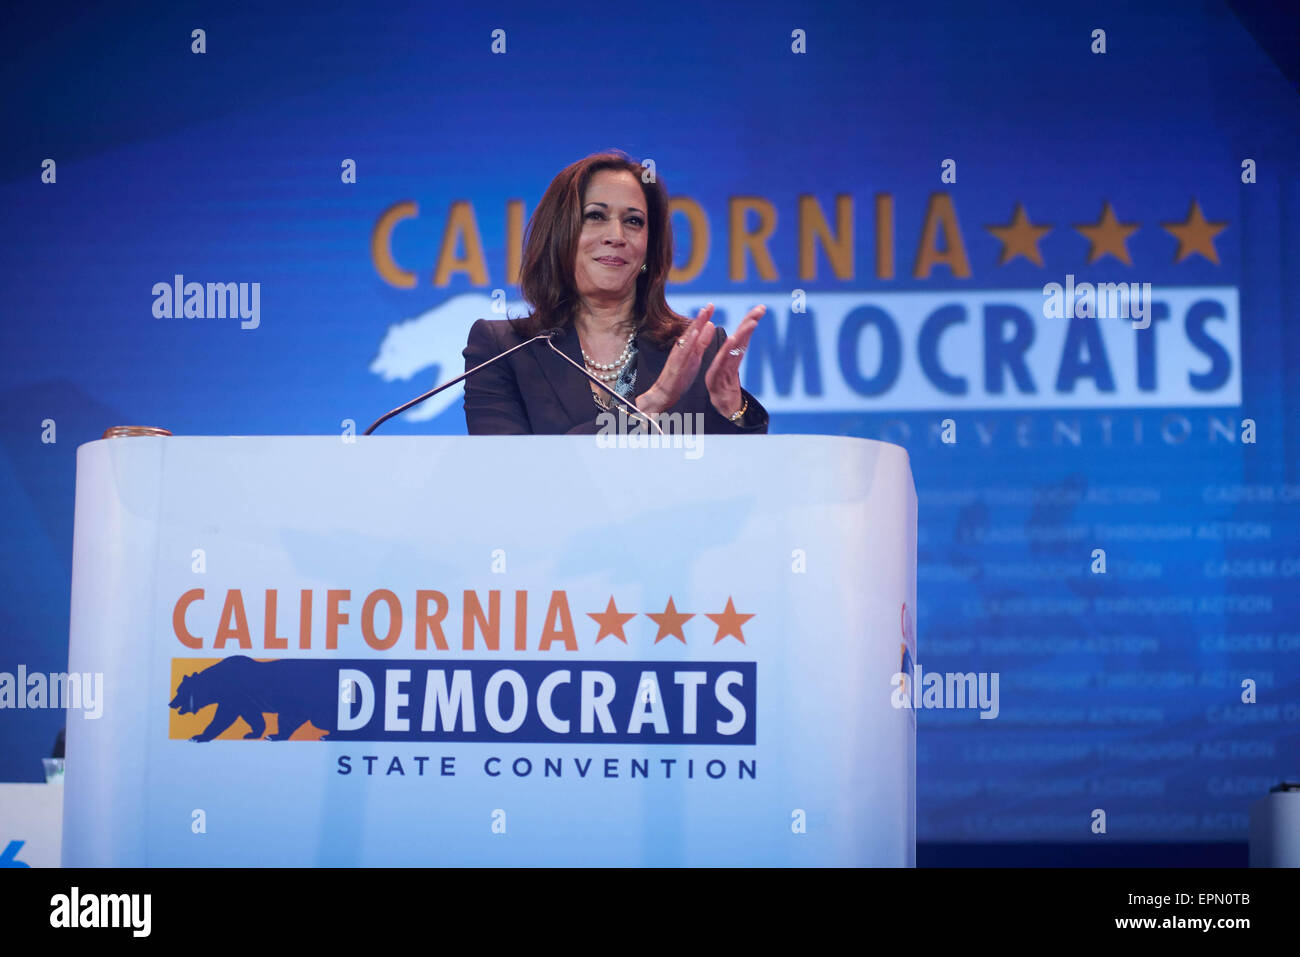 Attorney General Of California Address on adjutant general of california, legislative branch of california, mayor of california, first lady of california, president of california, judicial branch of california,